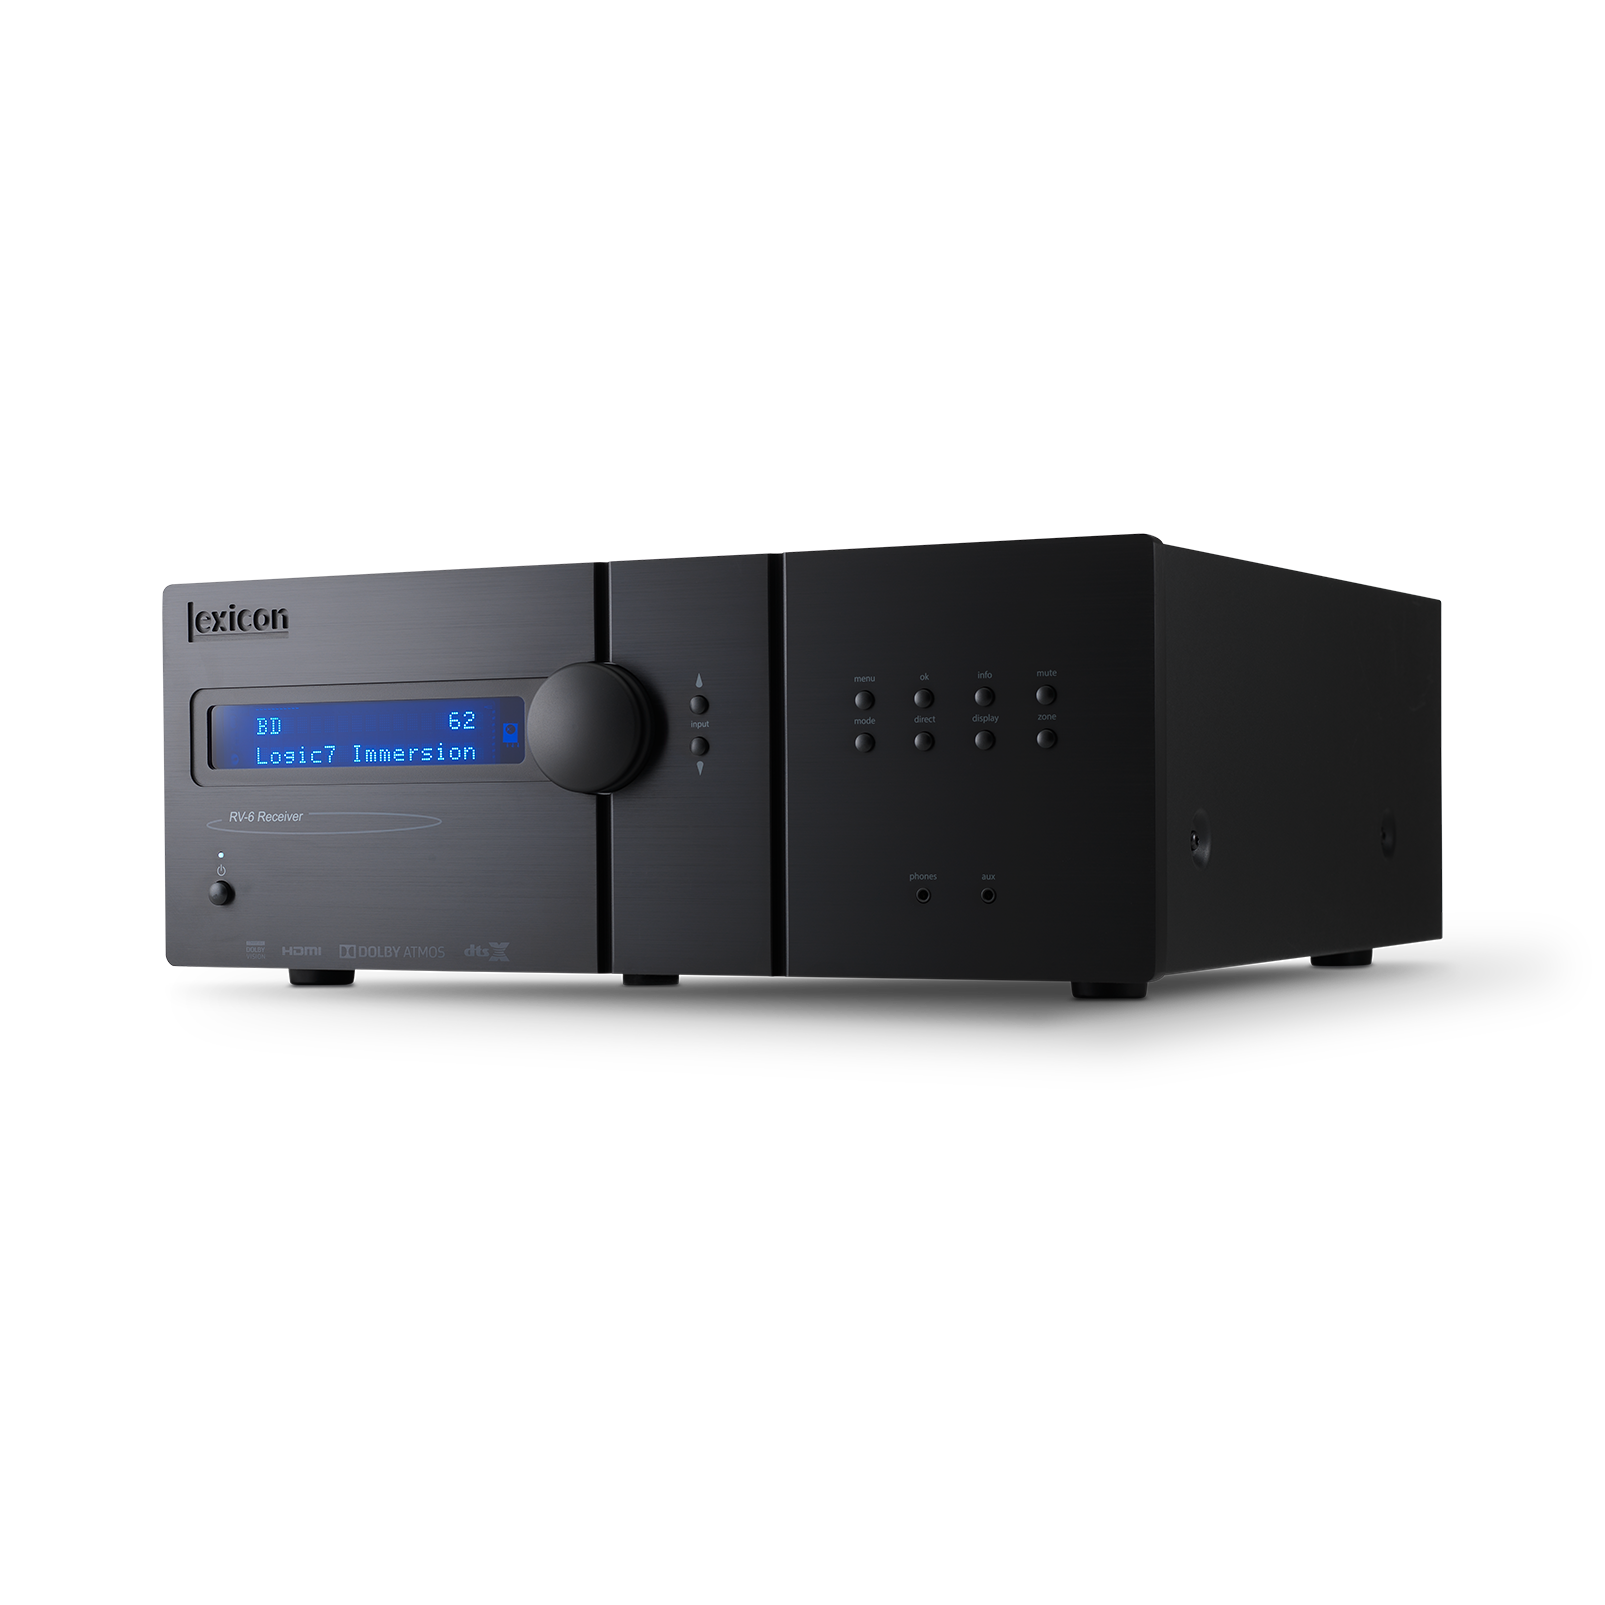 Lexicon RV - 6 Surround Sound Receiver